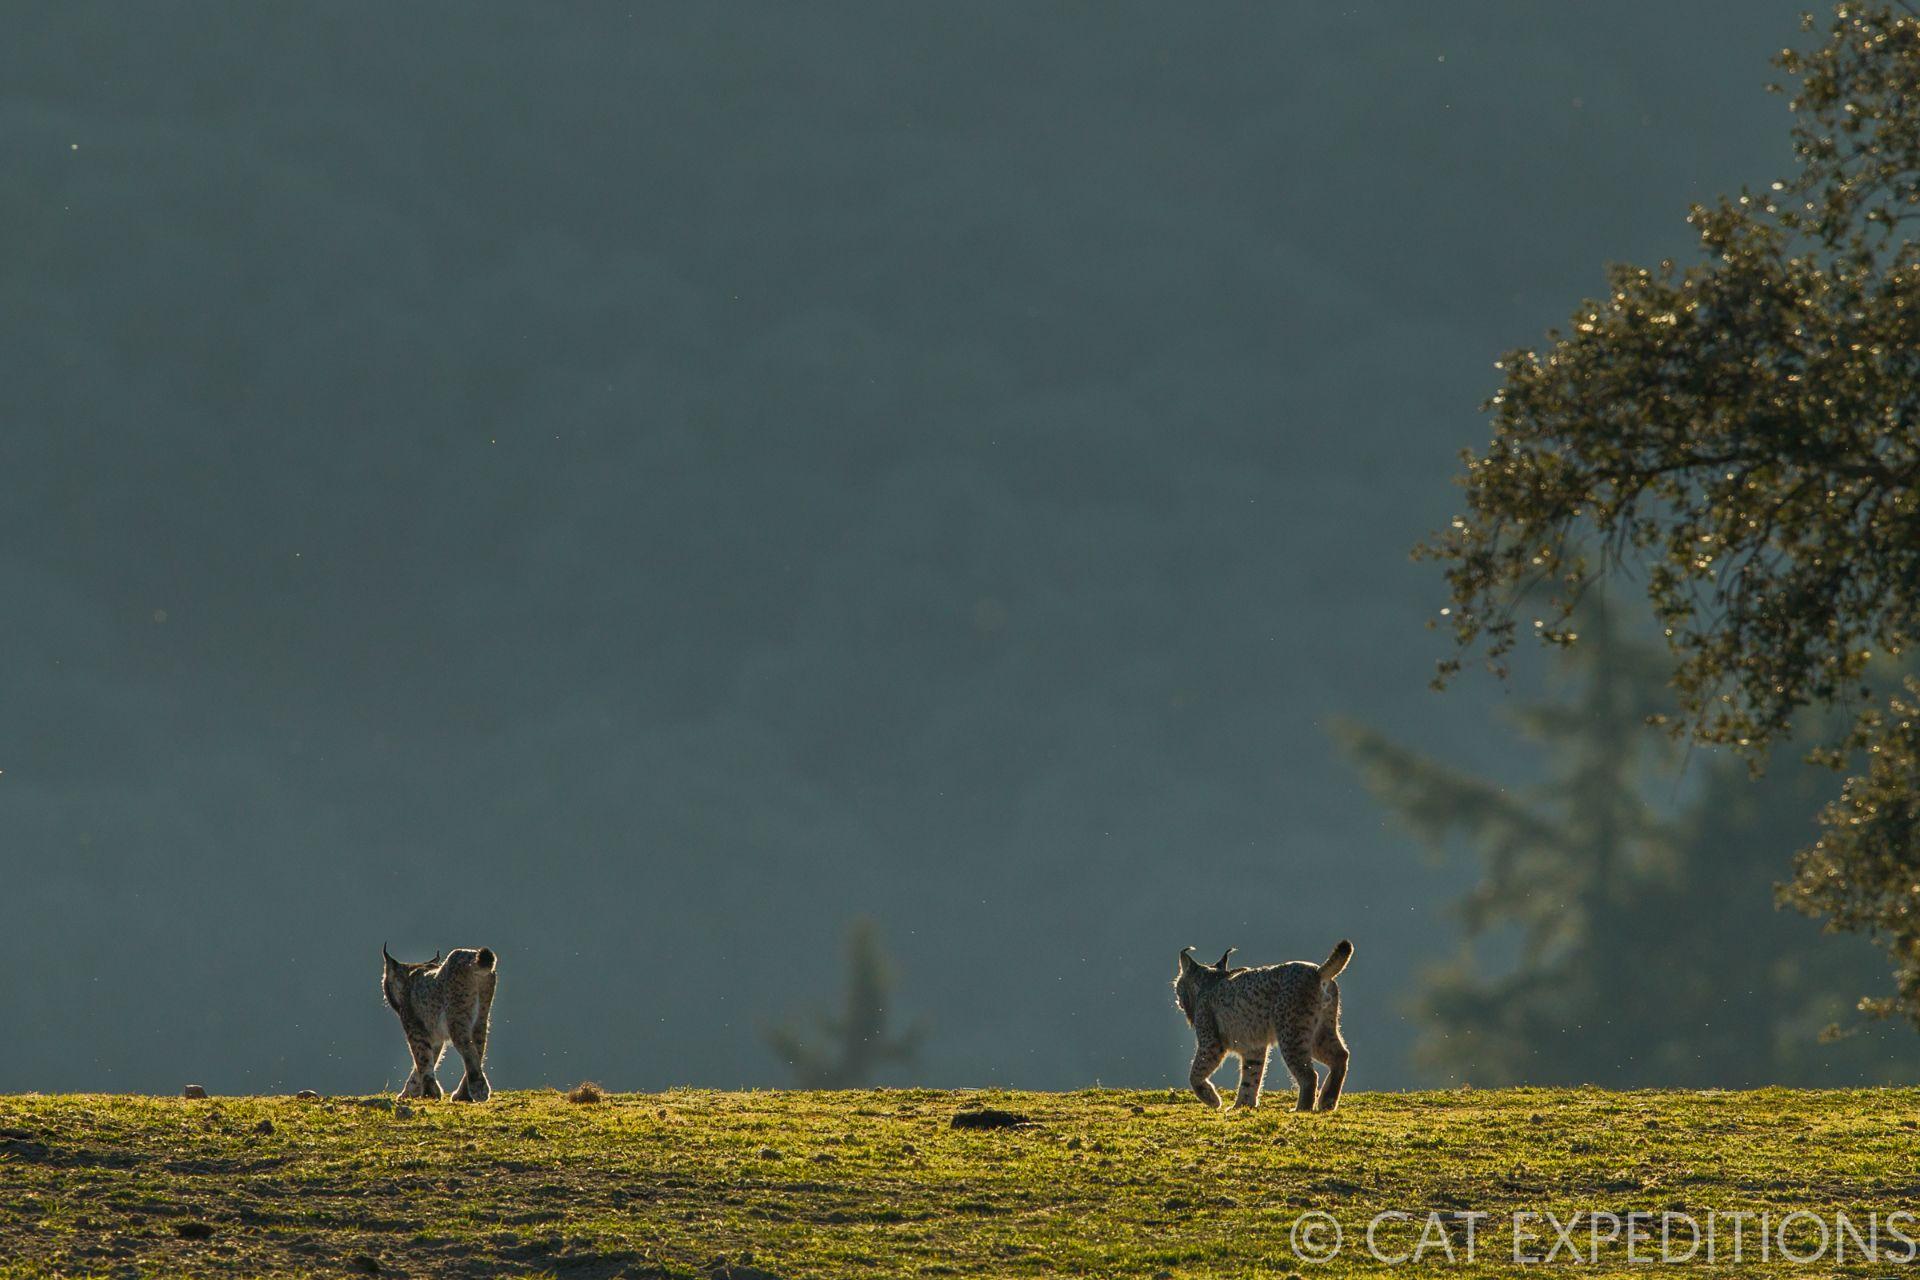 Spanish lynx mating pair